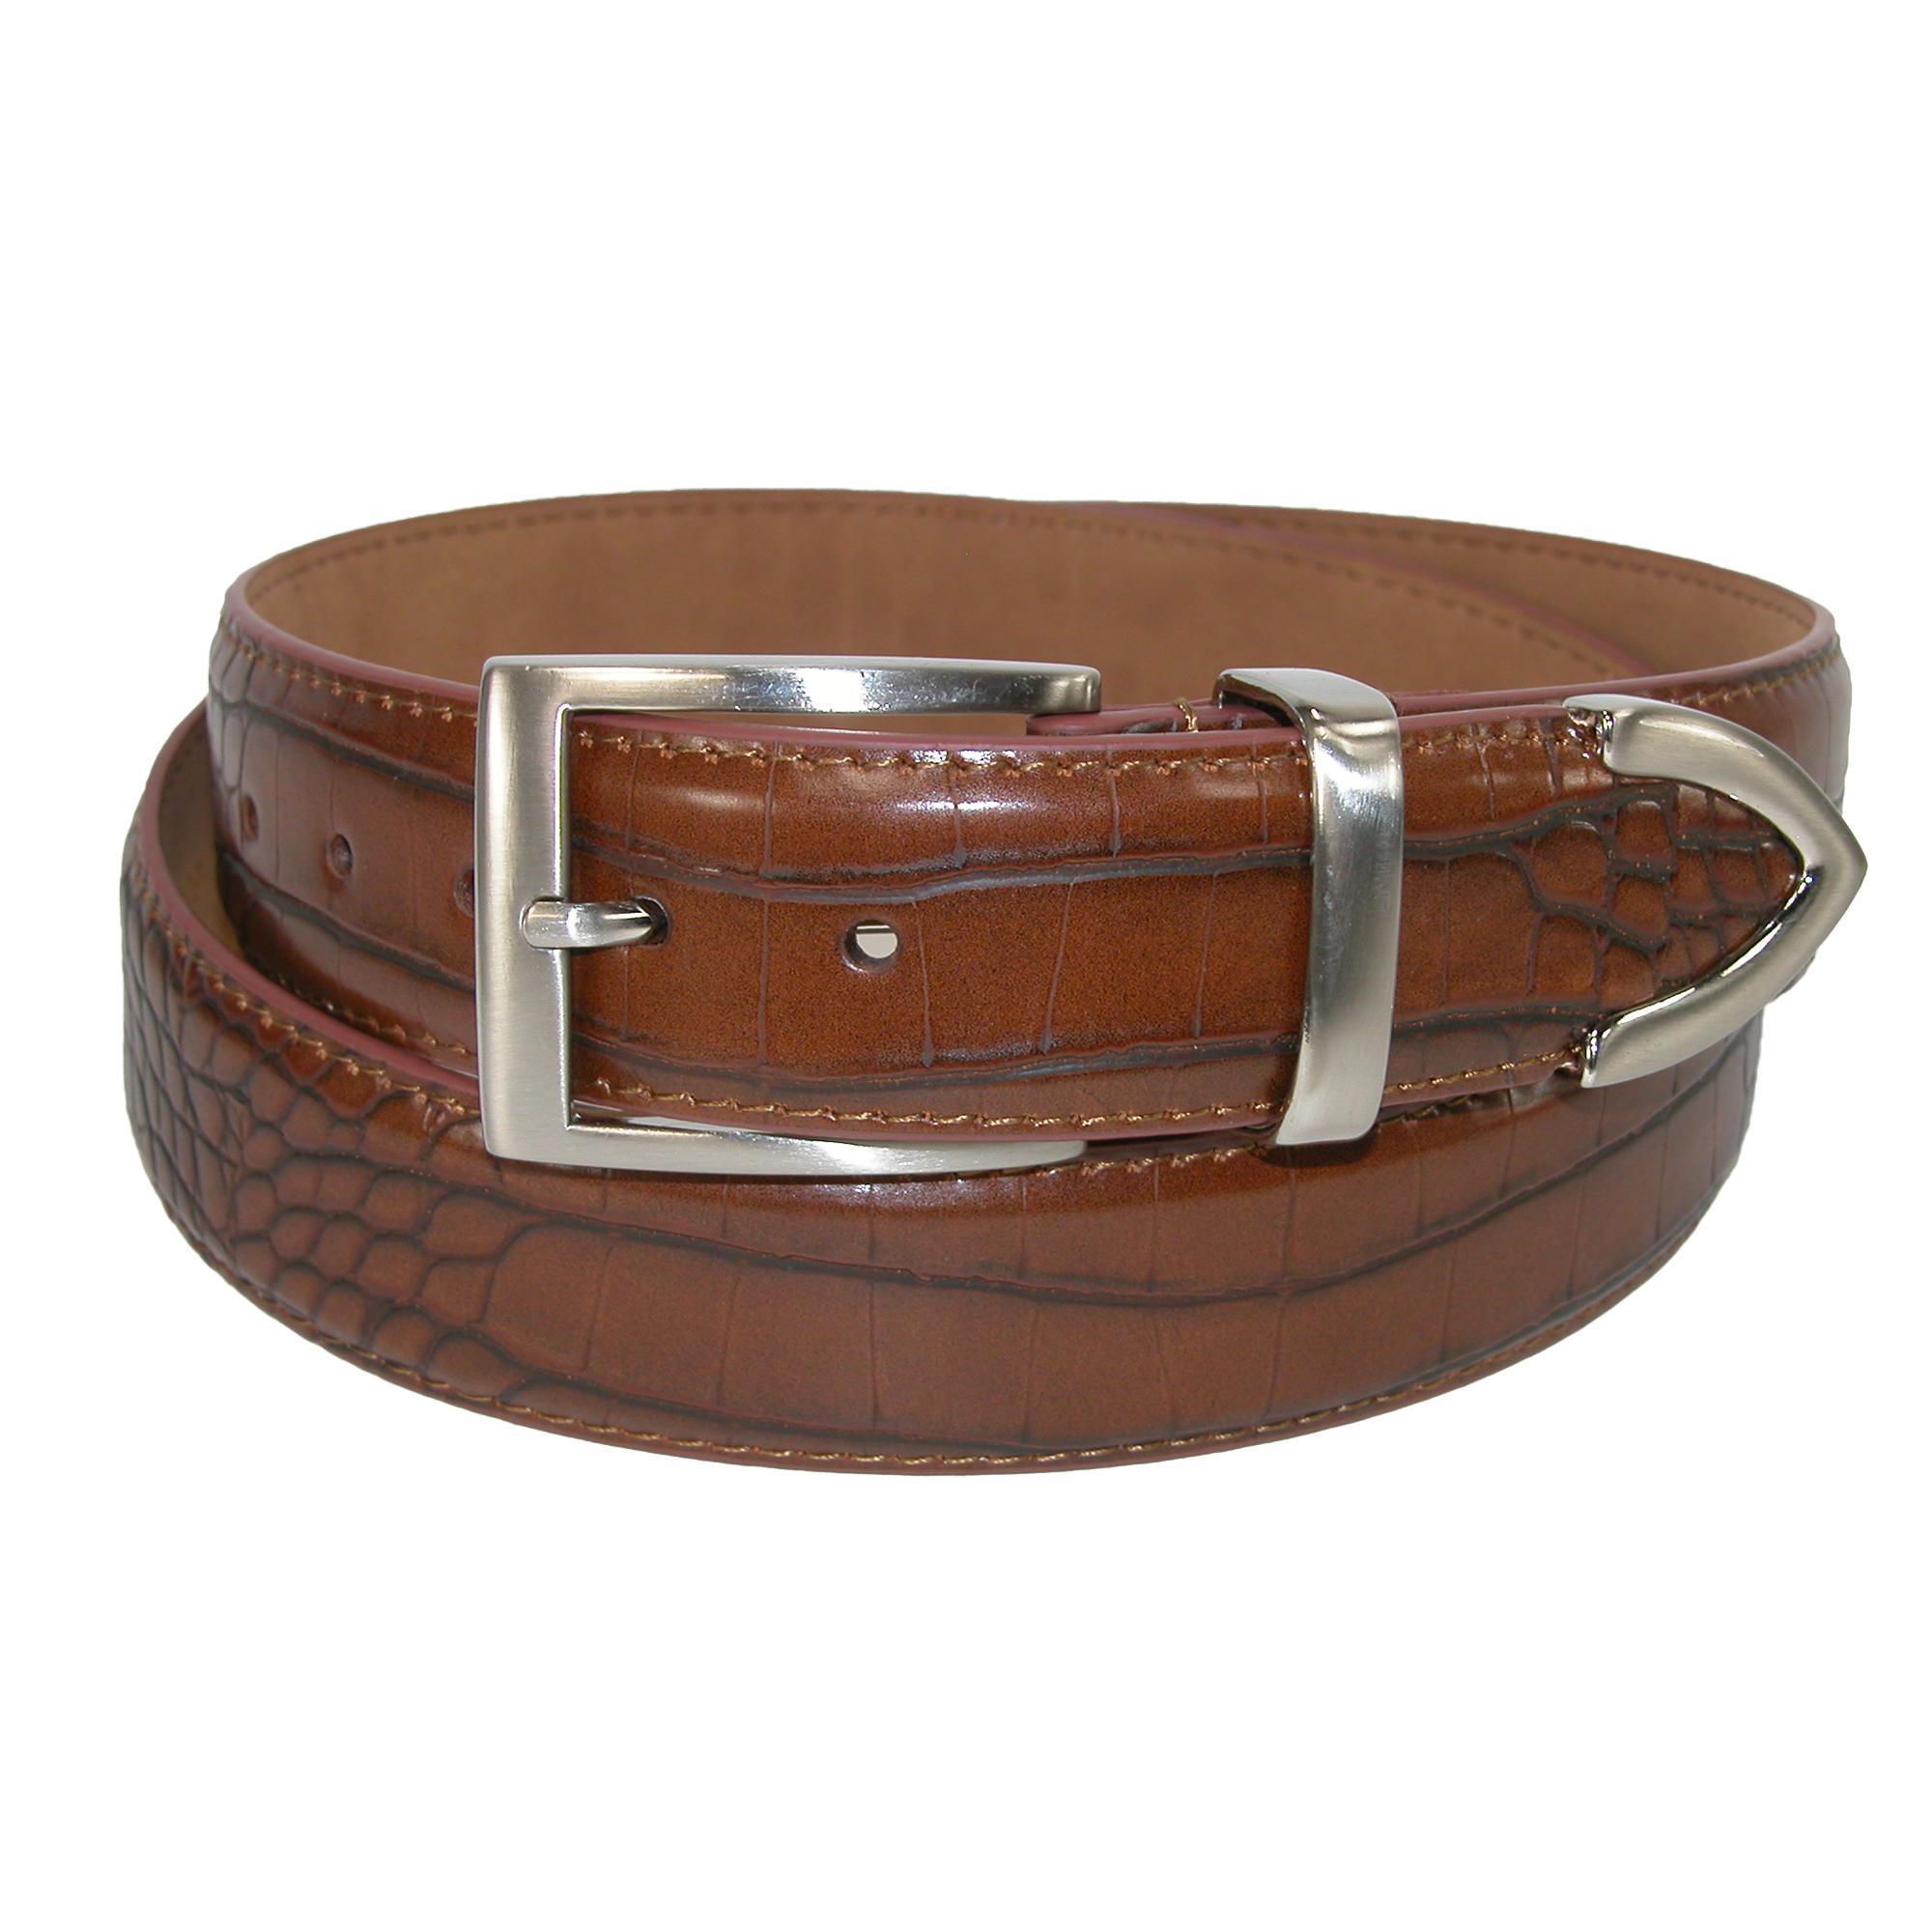 Pga Tour Mens Croco Print 3 Piece Leather Belt